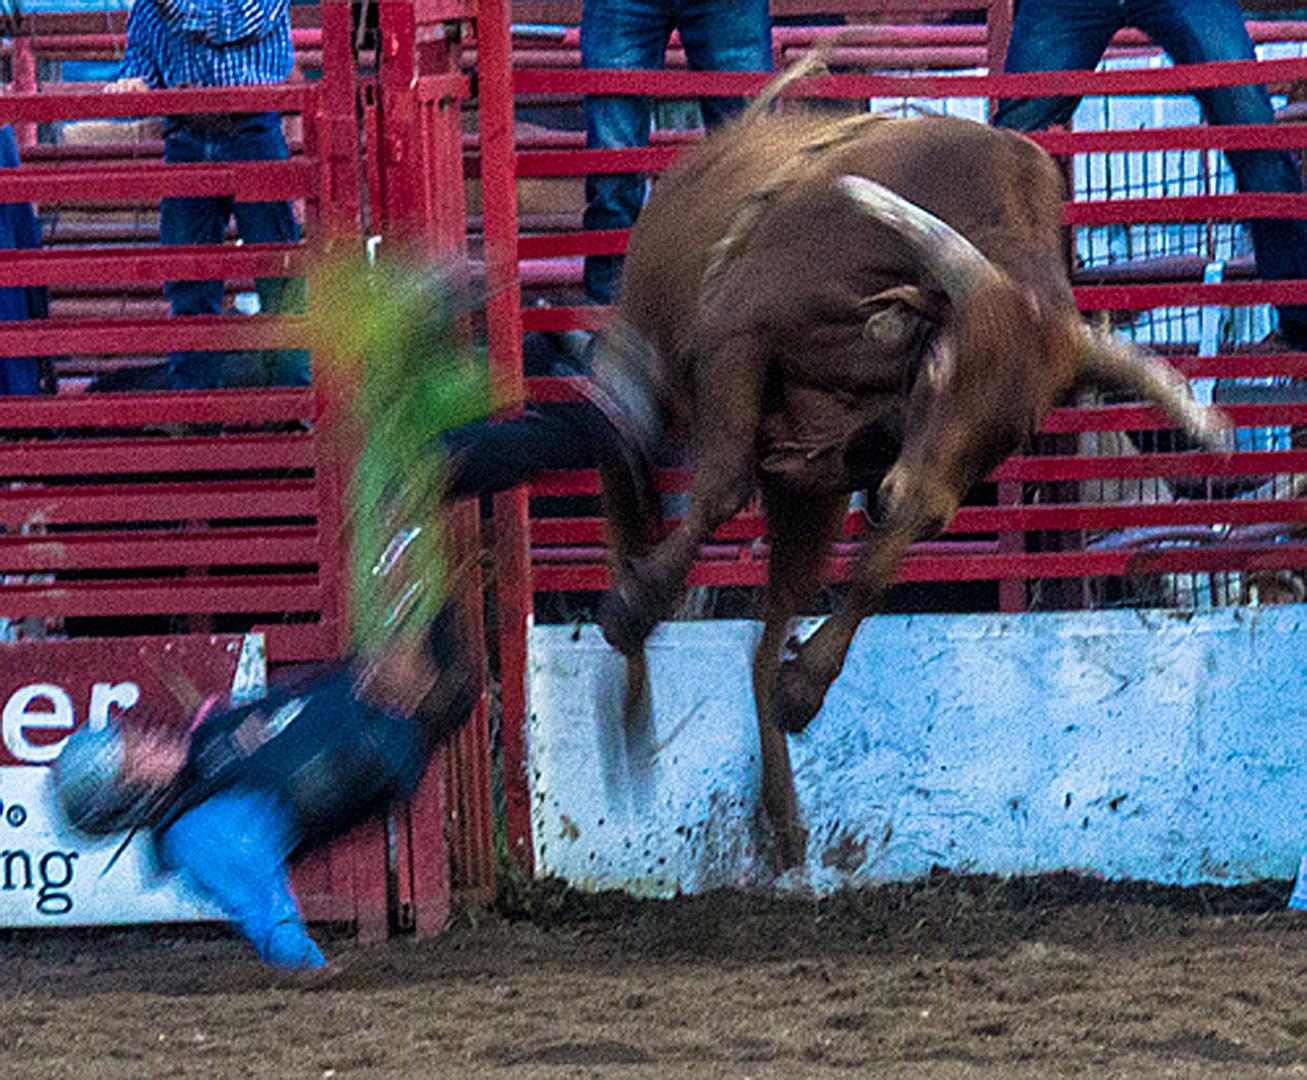 Airborne Bull Rider - Digital (Action) - Name Withheld Per Request